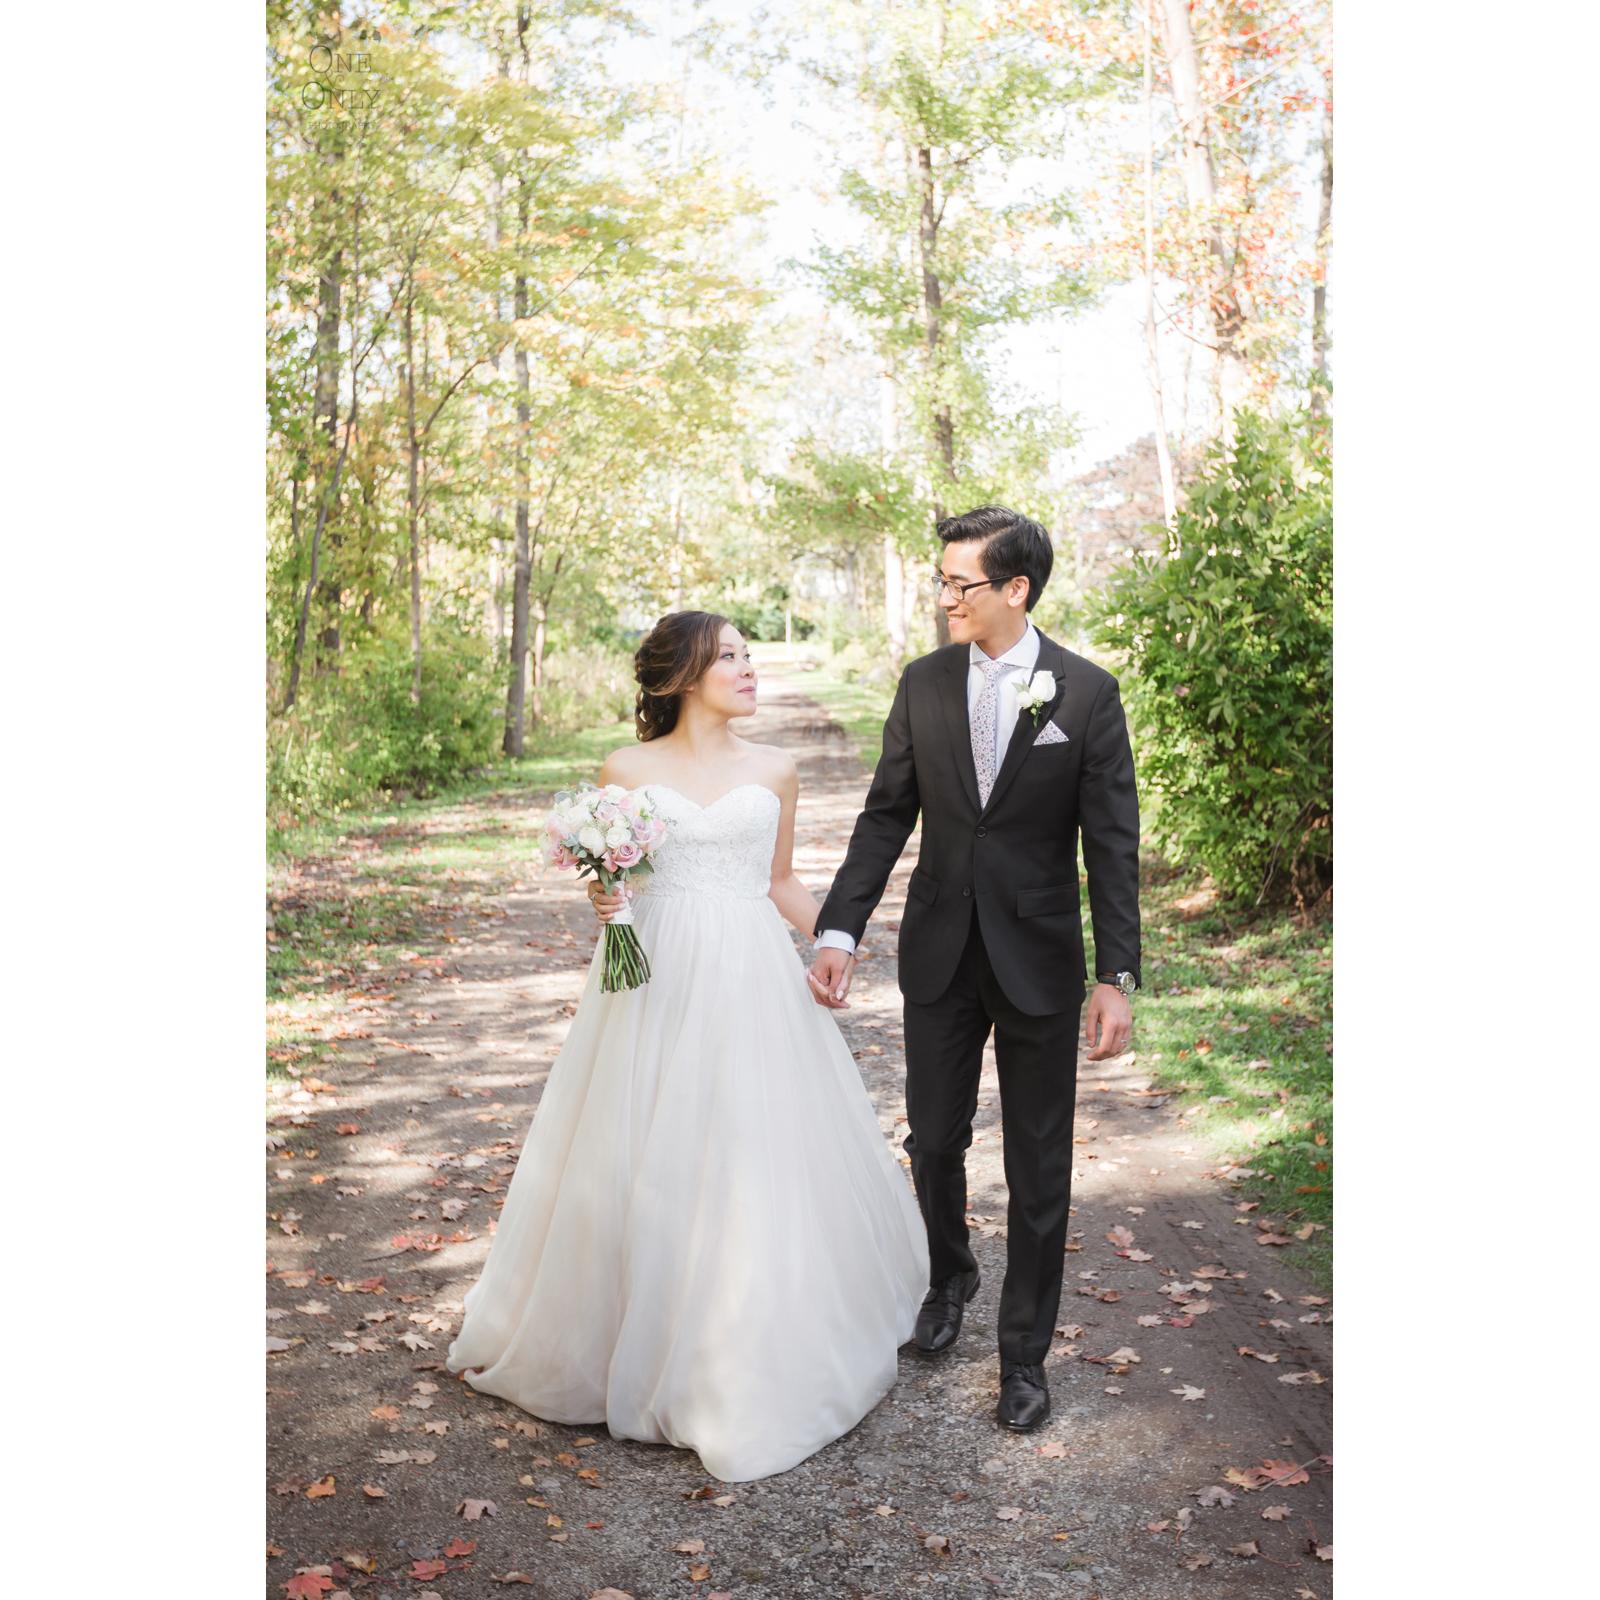 Summer + Mark's wedding day